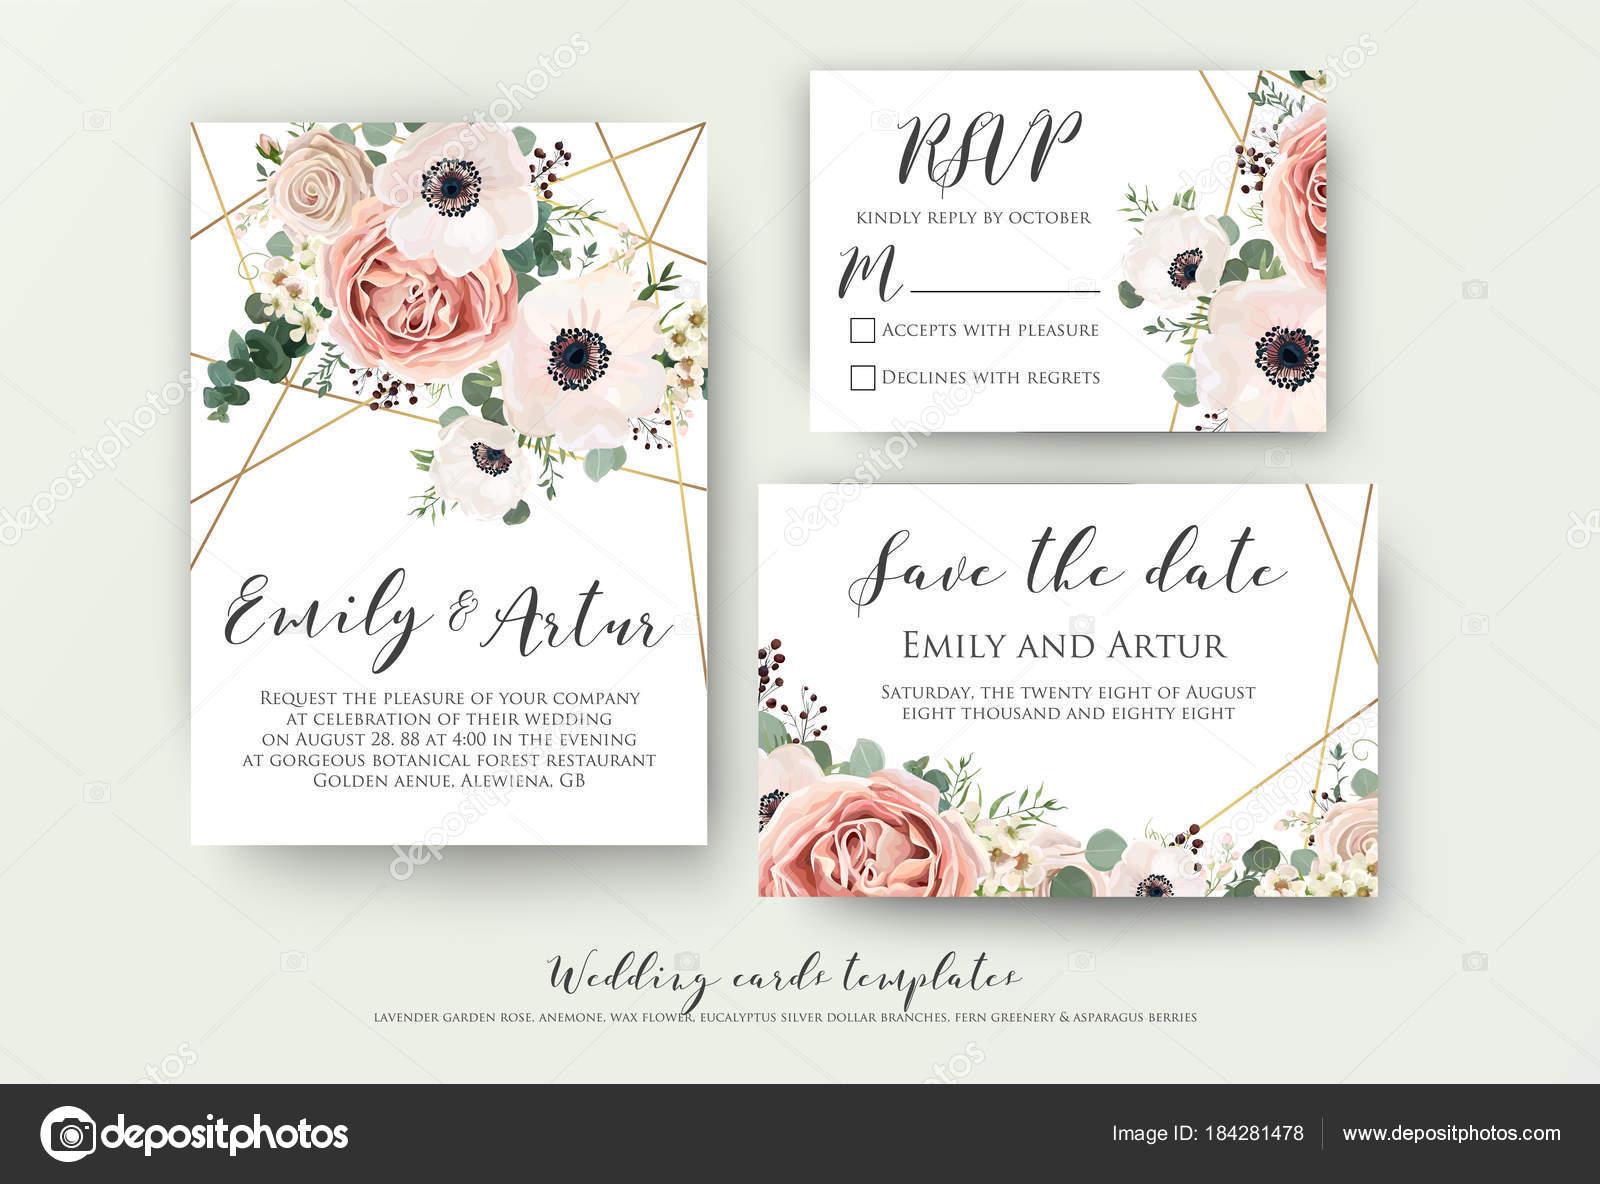 Boda tarjeta de dise o invitaci n de boda invitaci n - Disenos tarjetas de boda ...